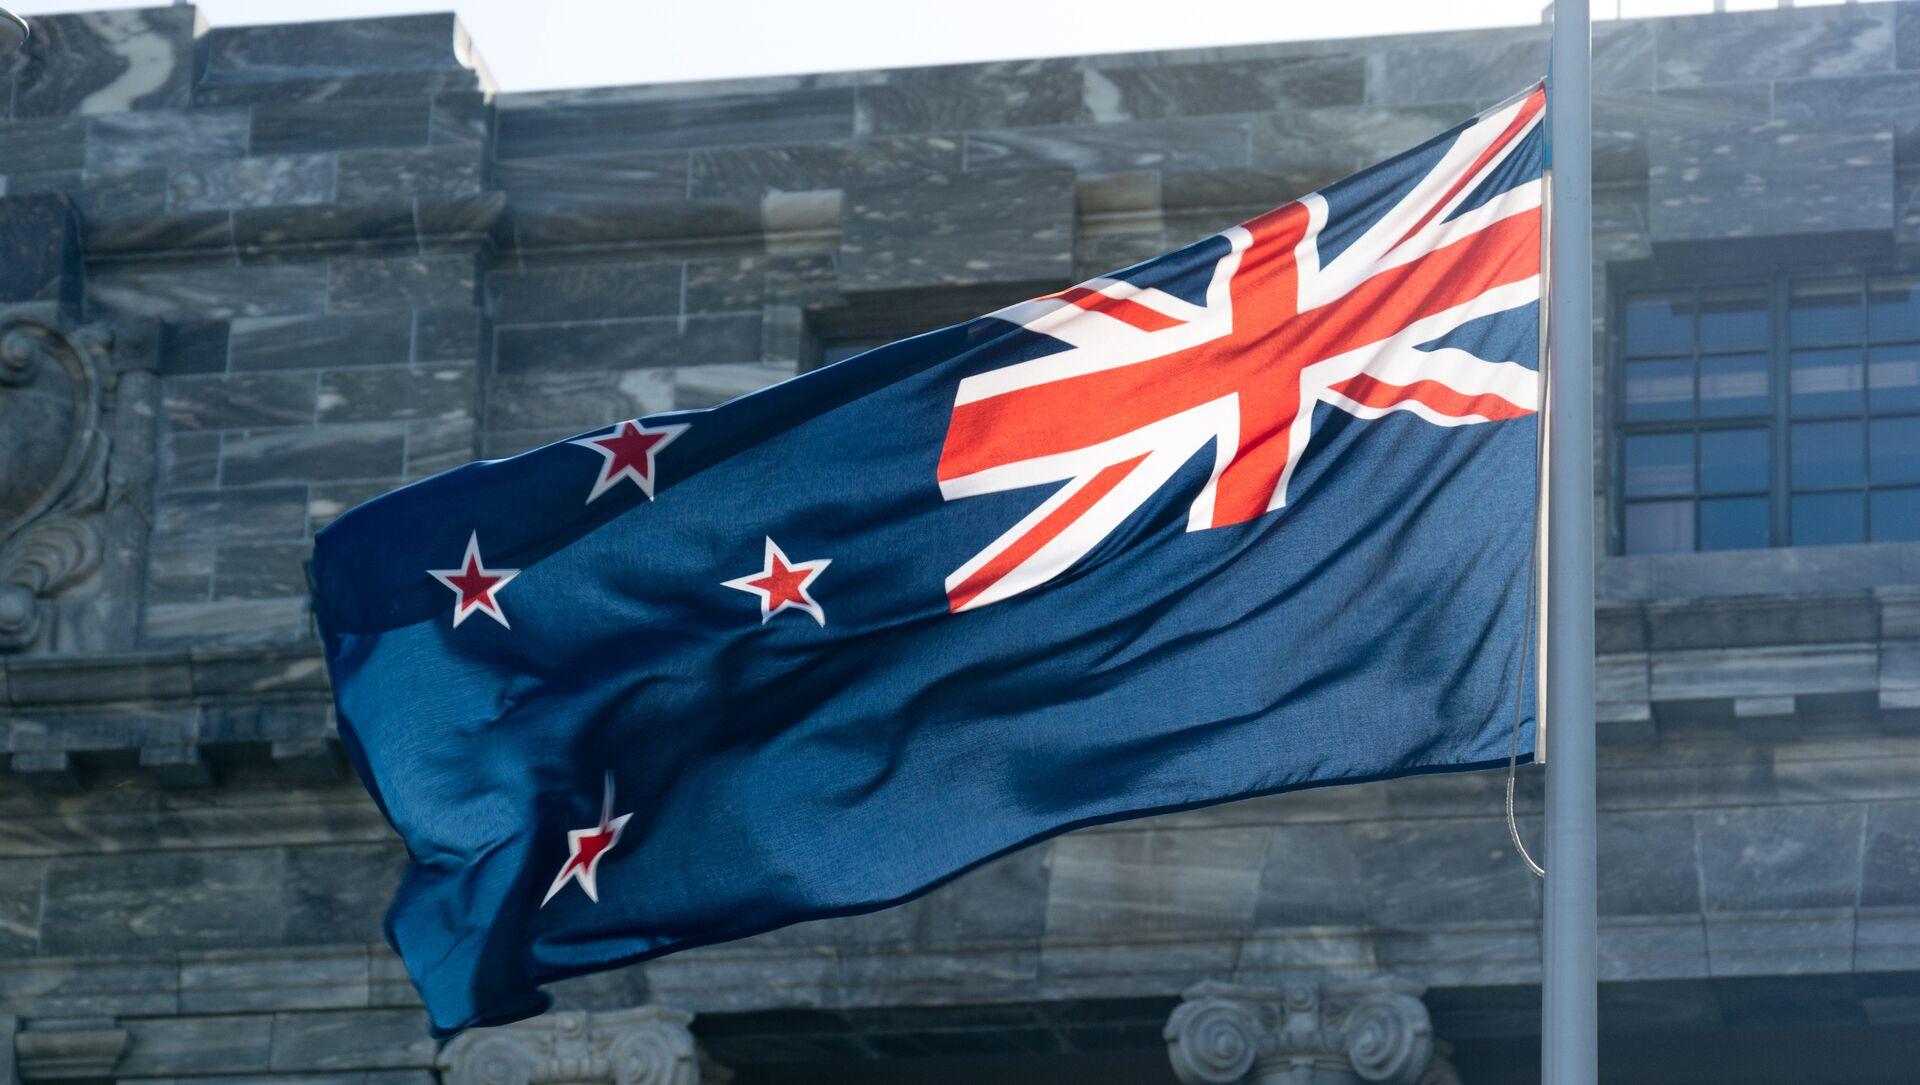 Bandera de Nueva Zelanda - Sputnik Mundo, 1920, 09.02.2021